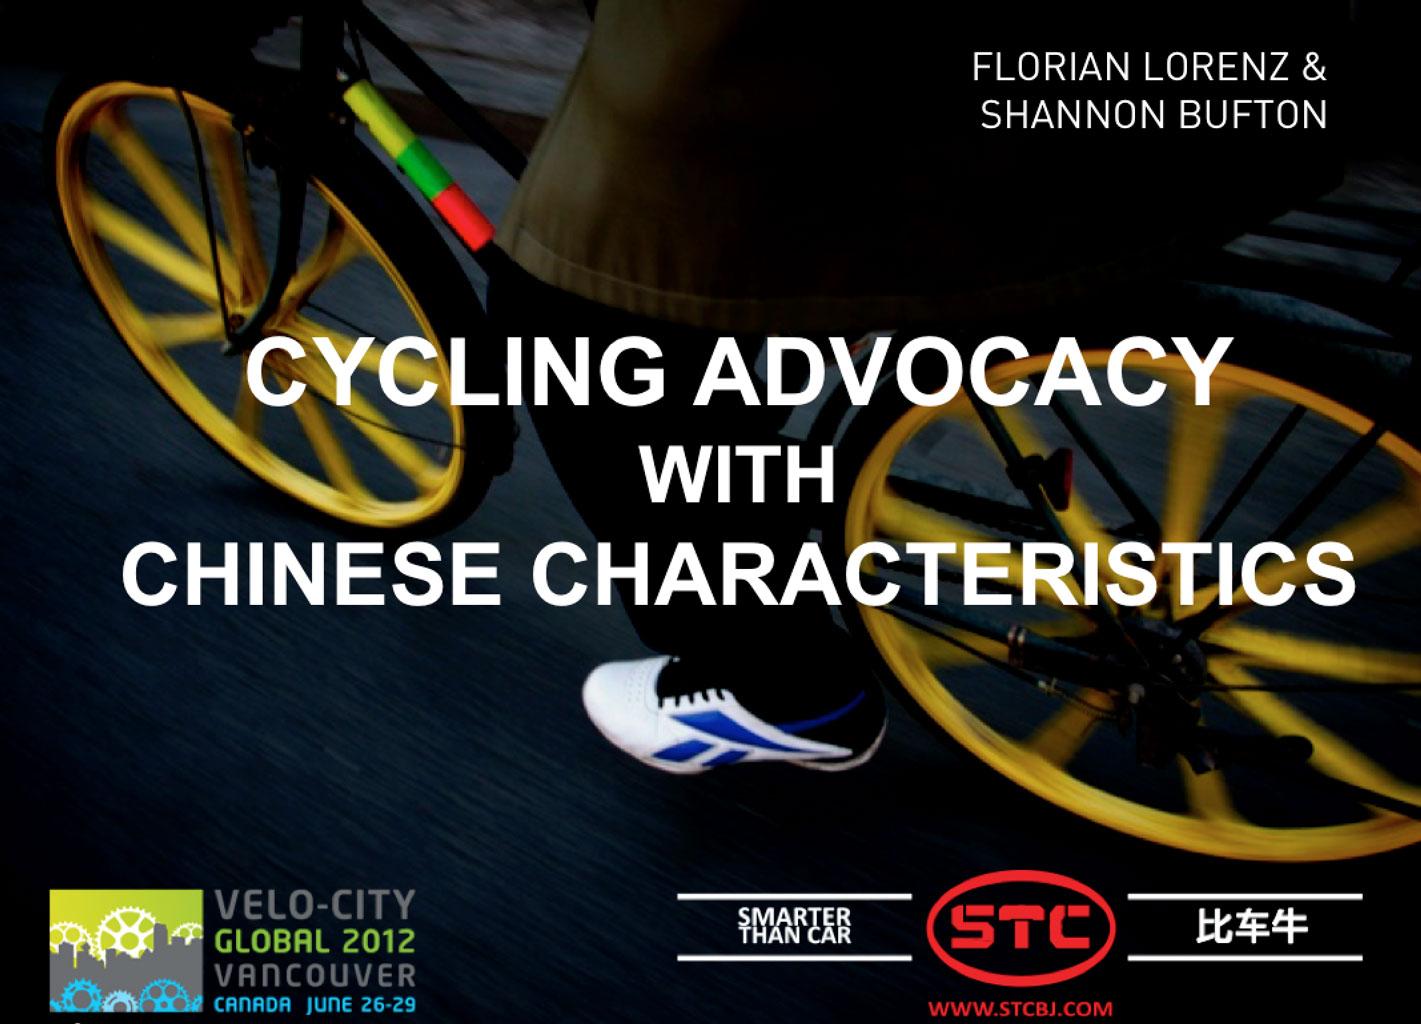 2012_STC_Velo-city_2012_Lorenz+Bufton_Cyclin-Advocacy-with-Chinese-Characteristics